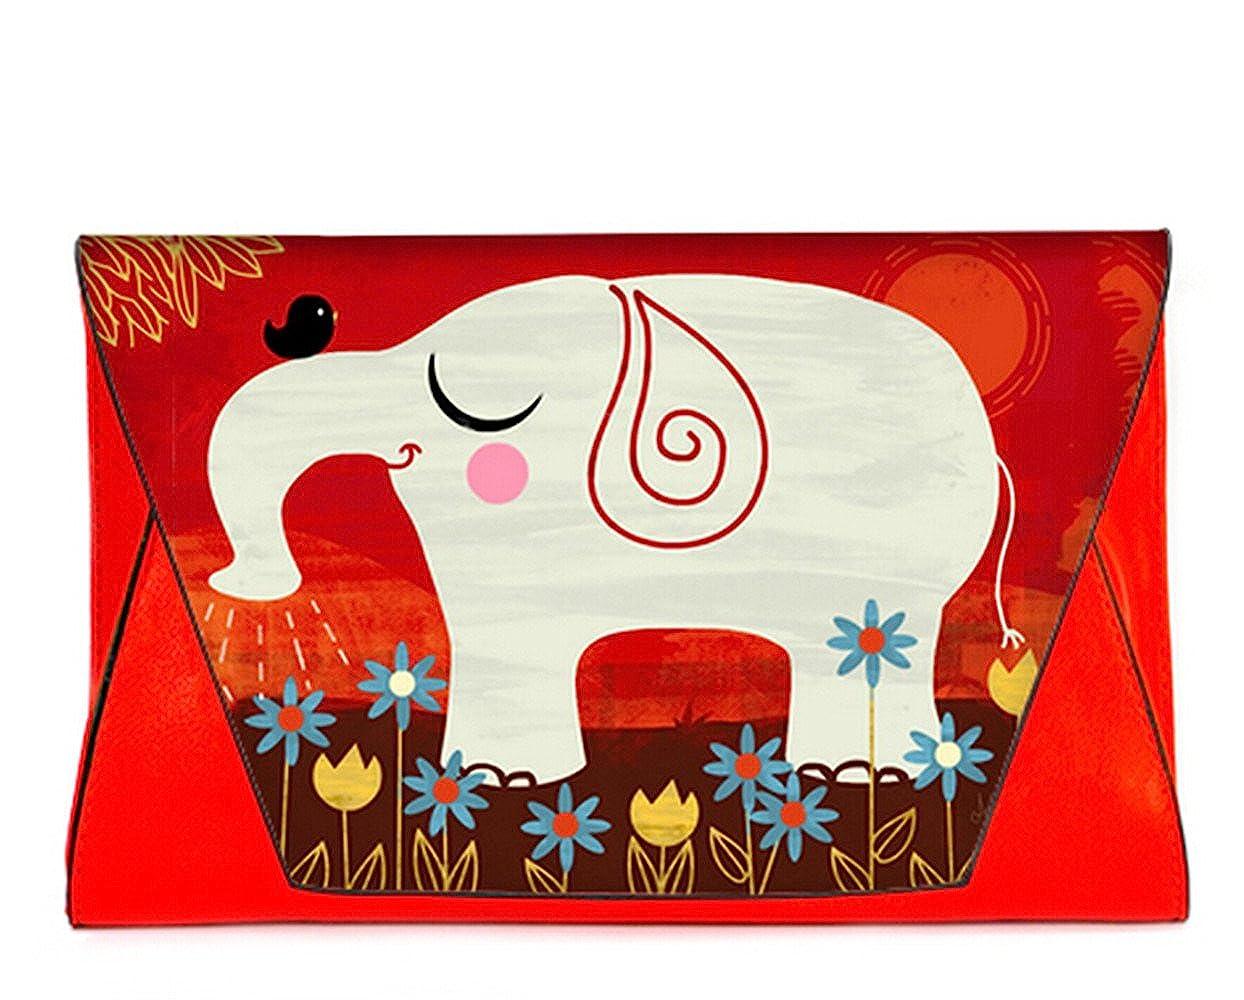 Fashion Leather Female Envelope Bag Clutch Handbags with Elephants Pattern